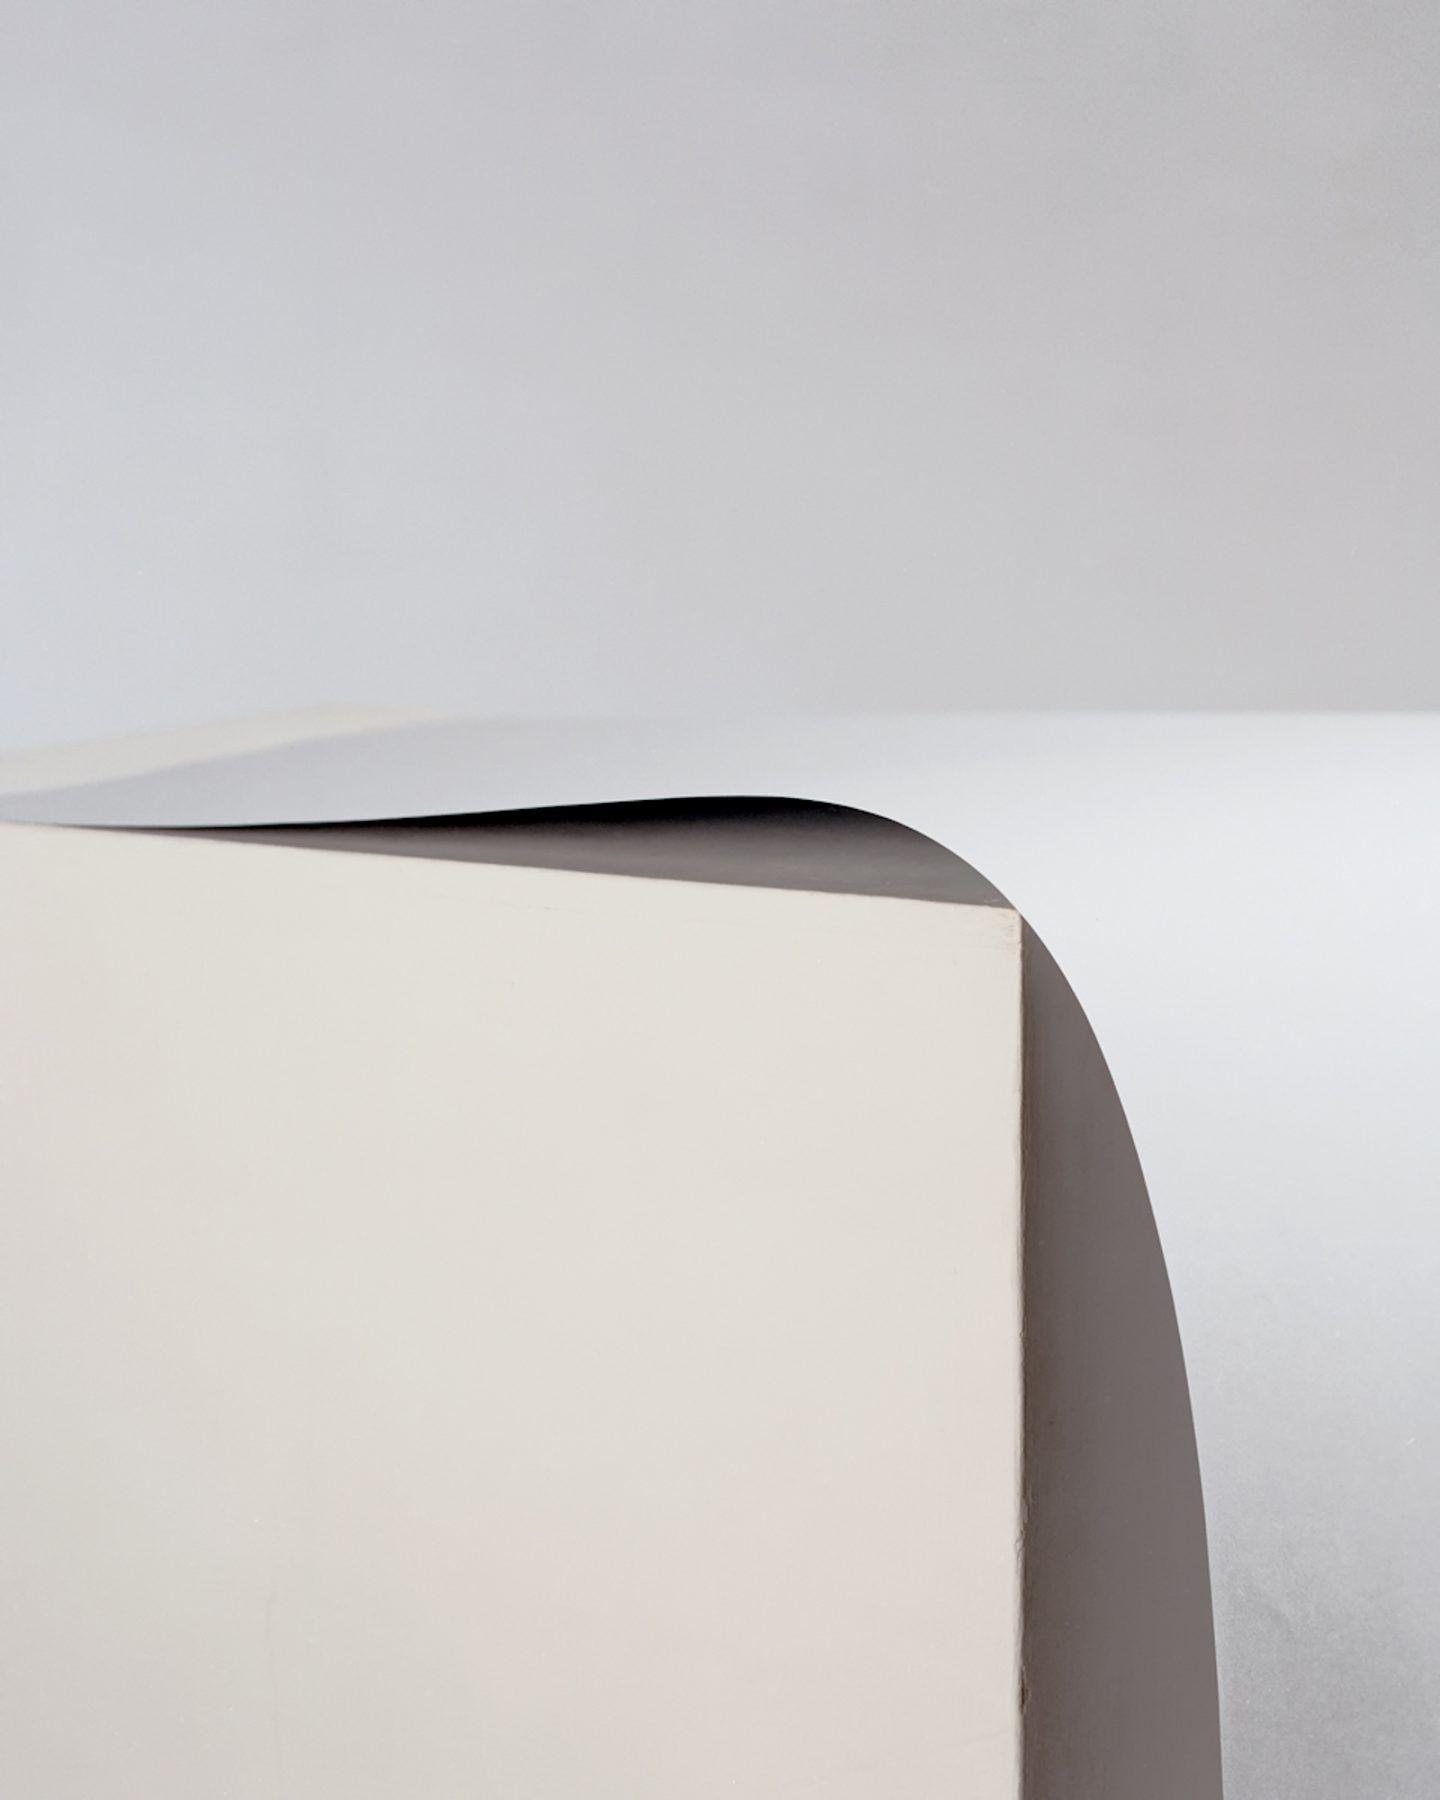 IGNANT-Photography-Studio-Holger-Kilumets-005